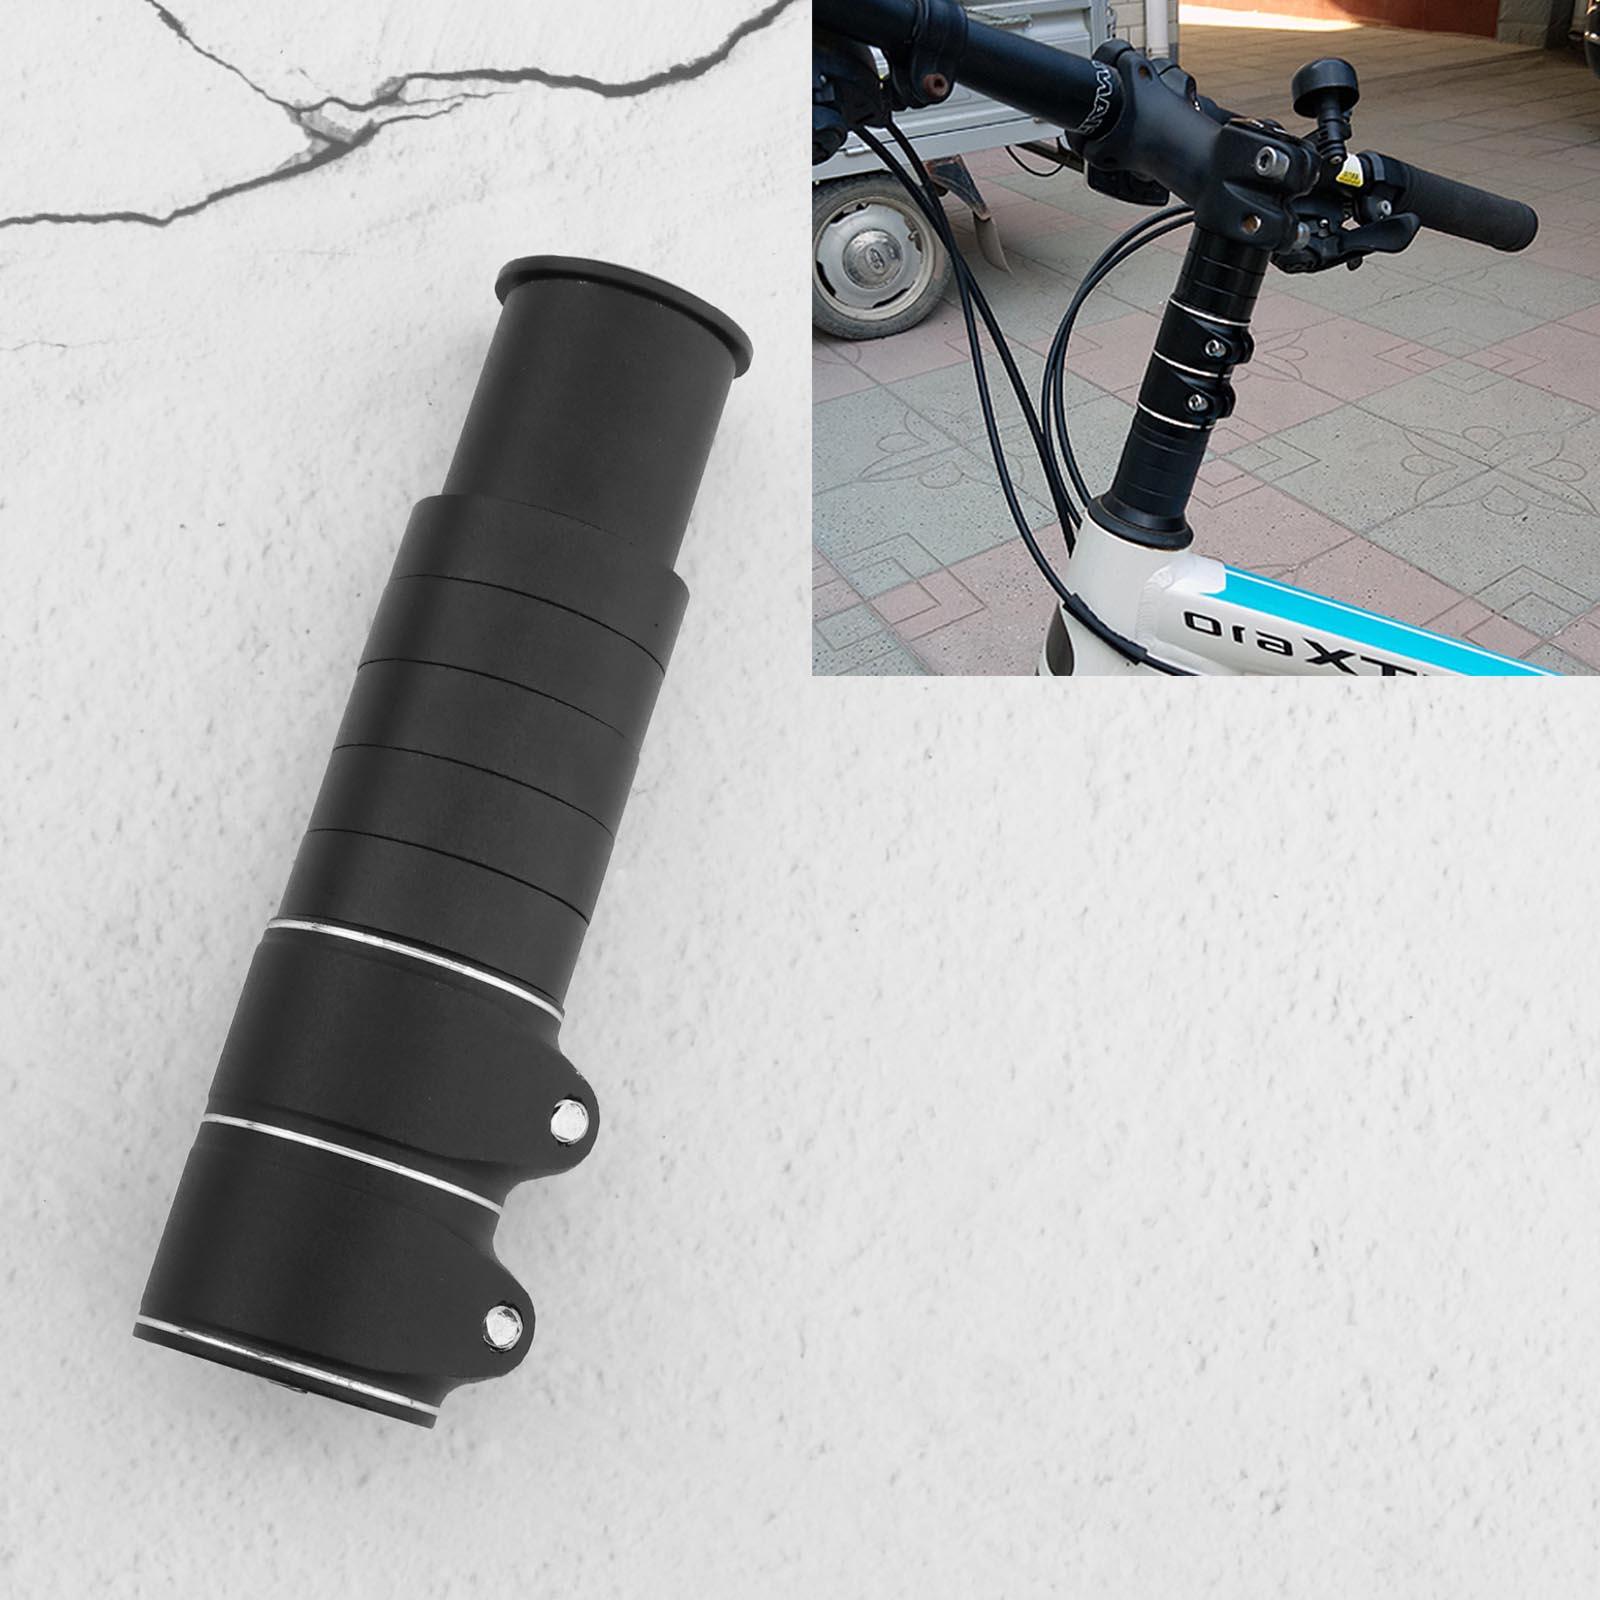 Mountain Bike Handlebar Front Fork Stem Riser Extension Scooter Adapter Black